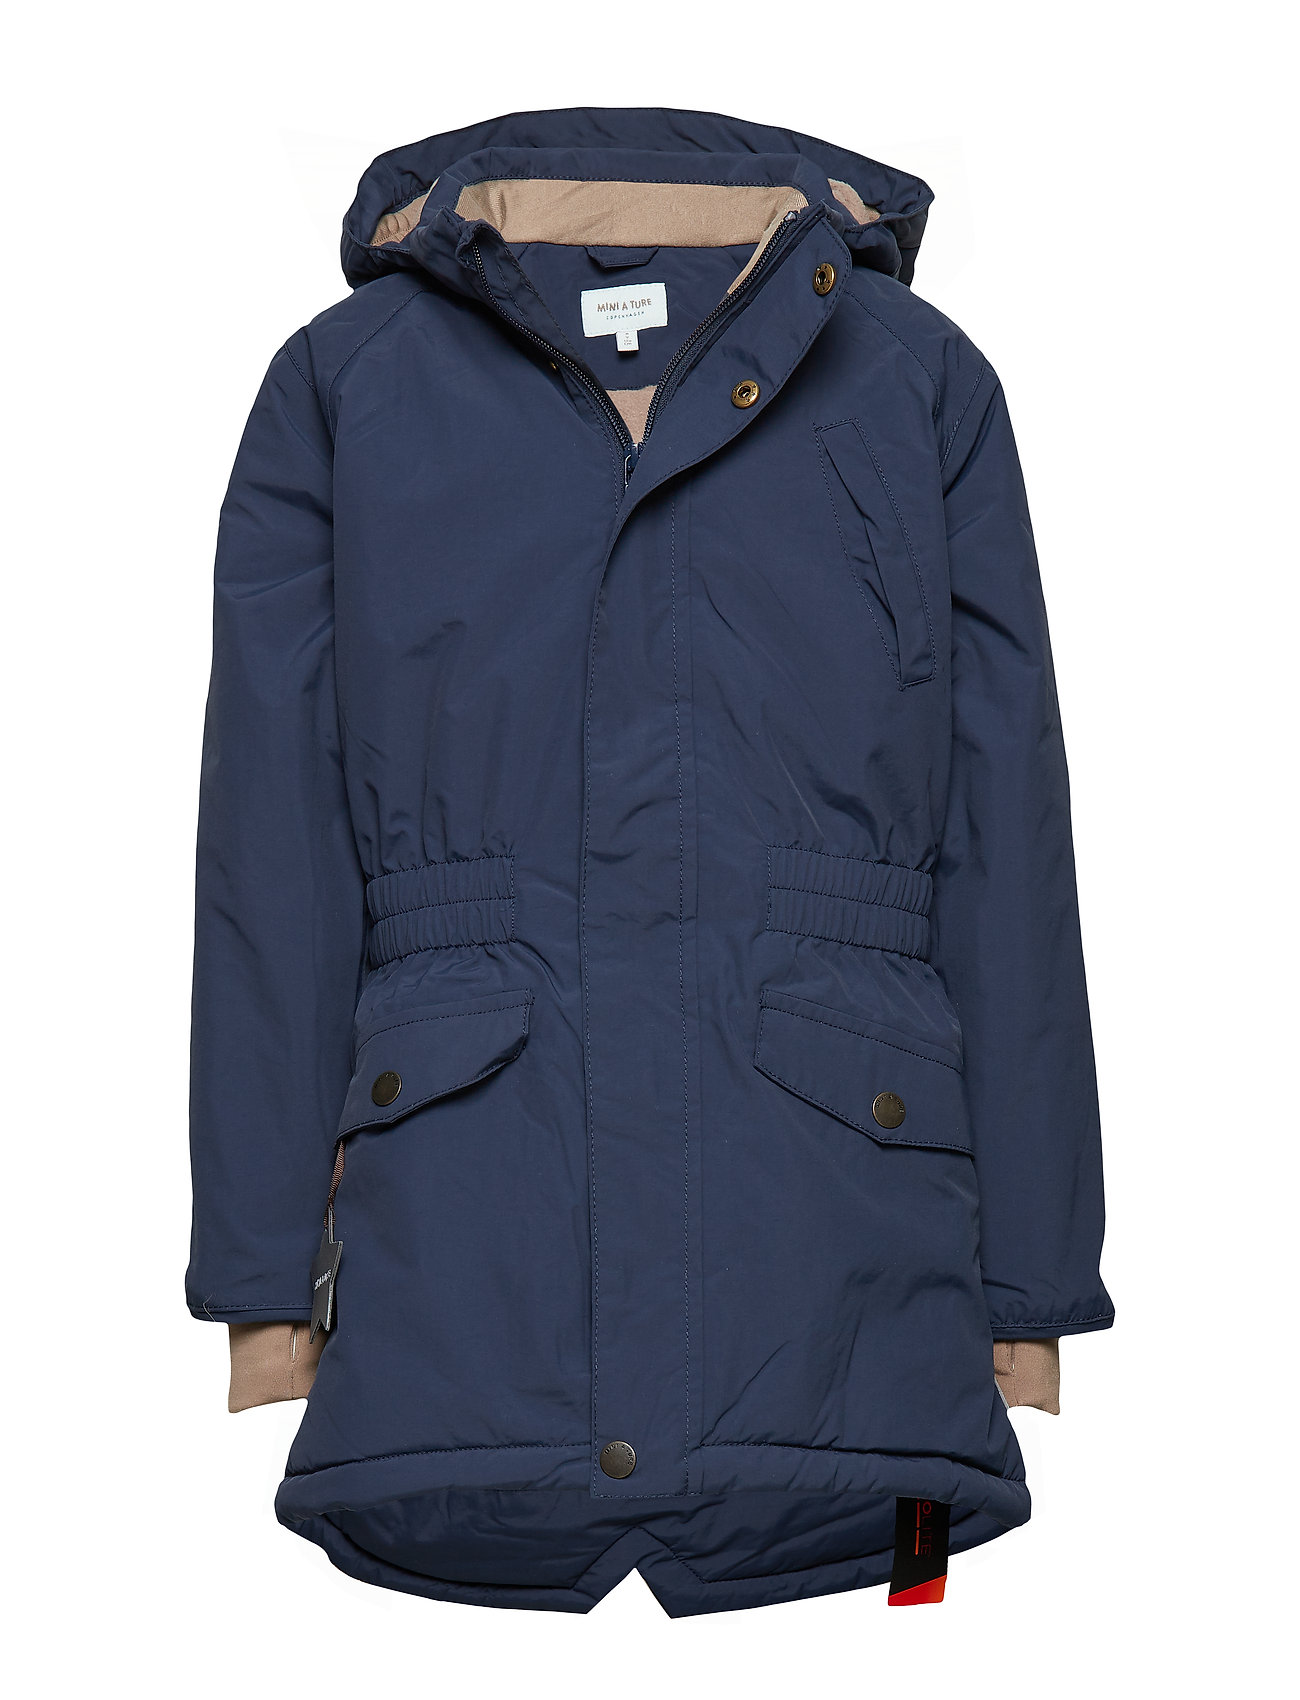 Mini A Ture Vibse Jacket, K - PEACOAT BLUE